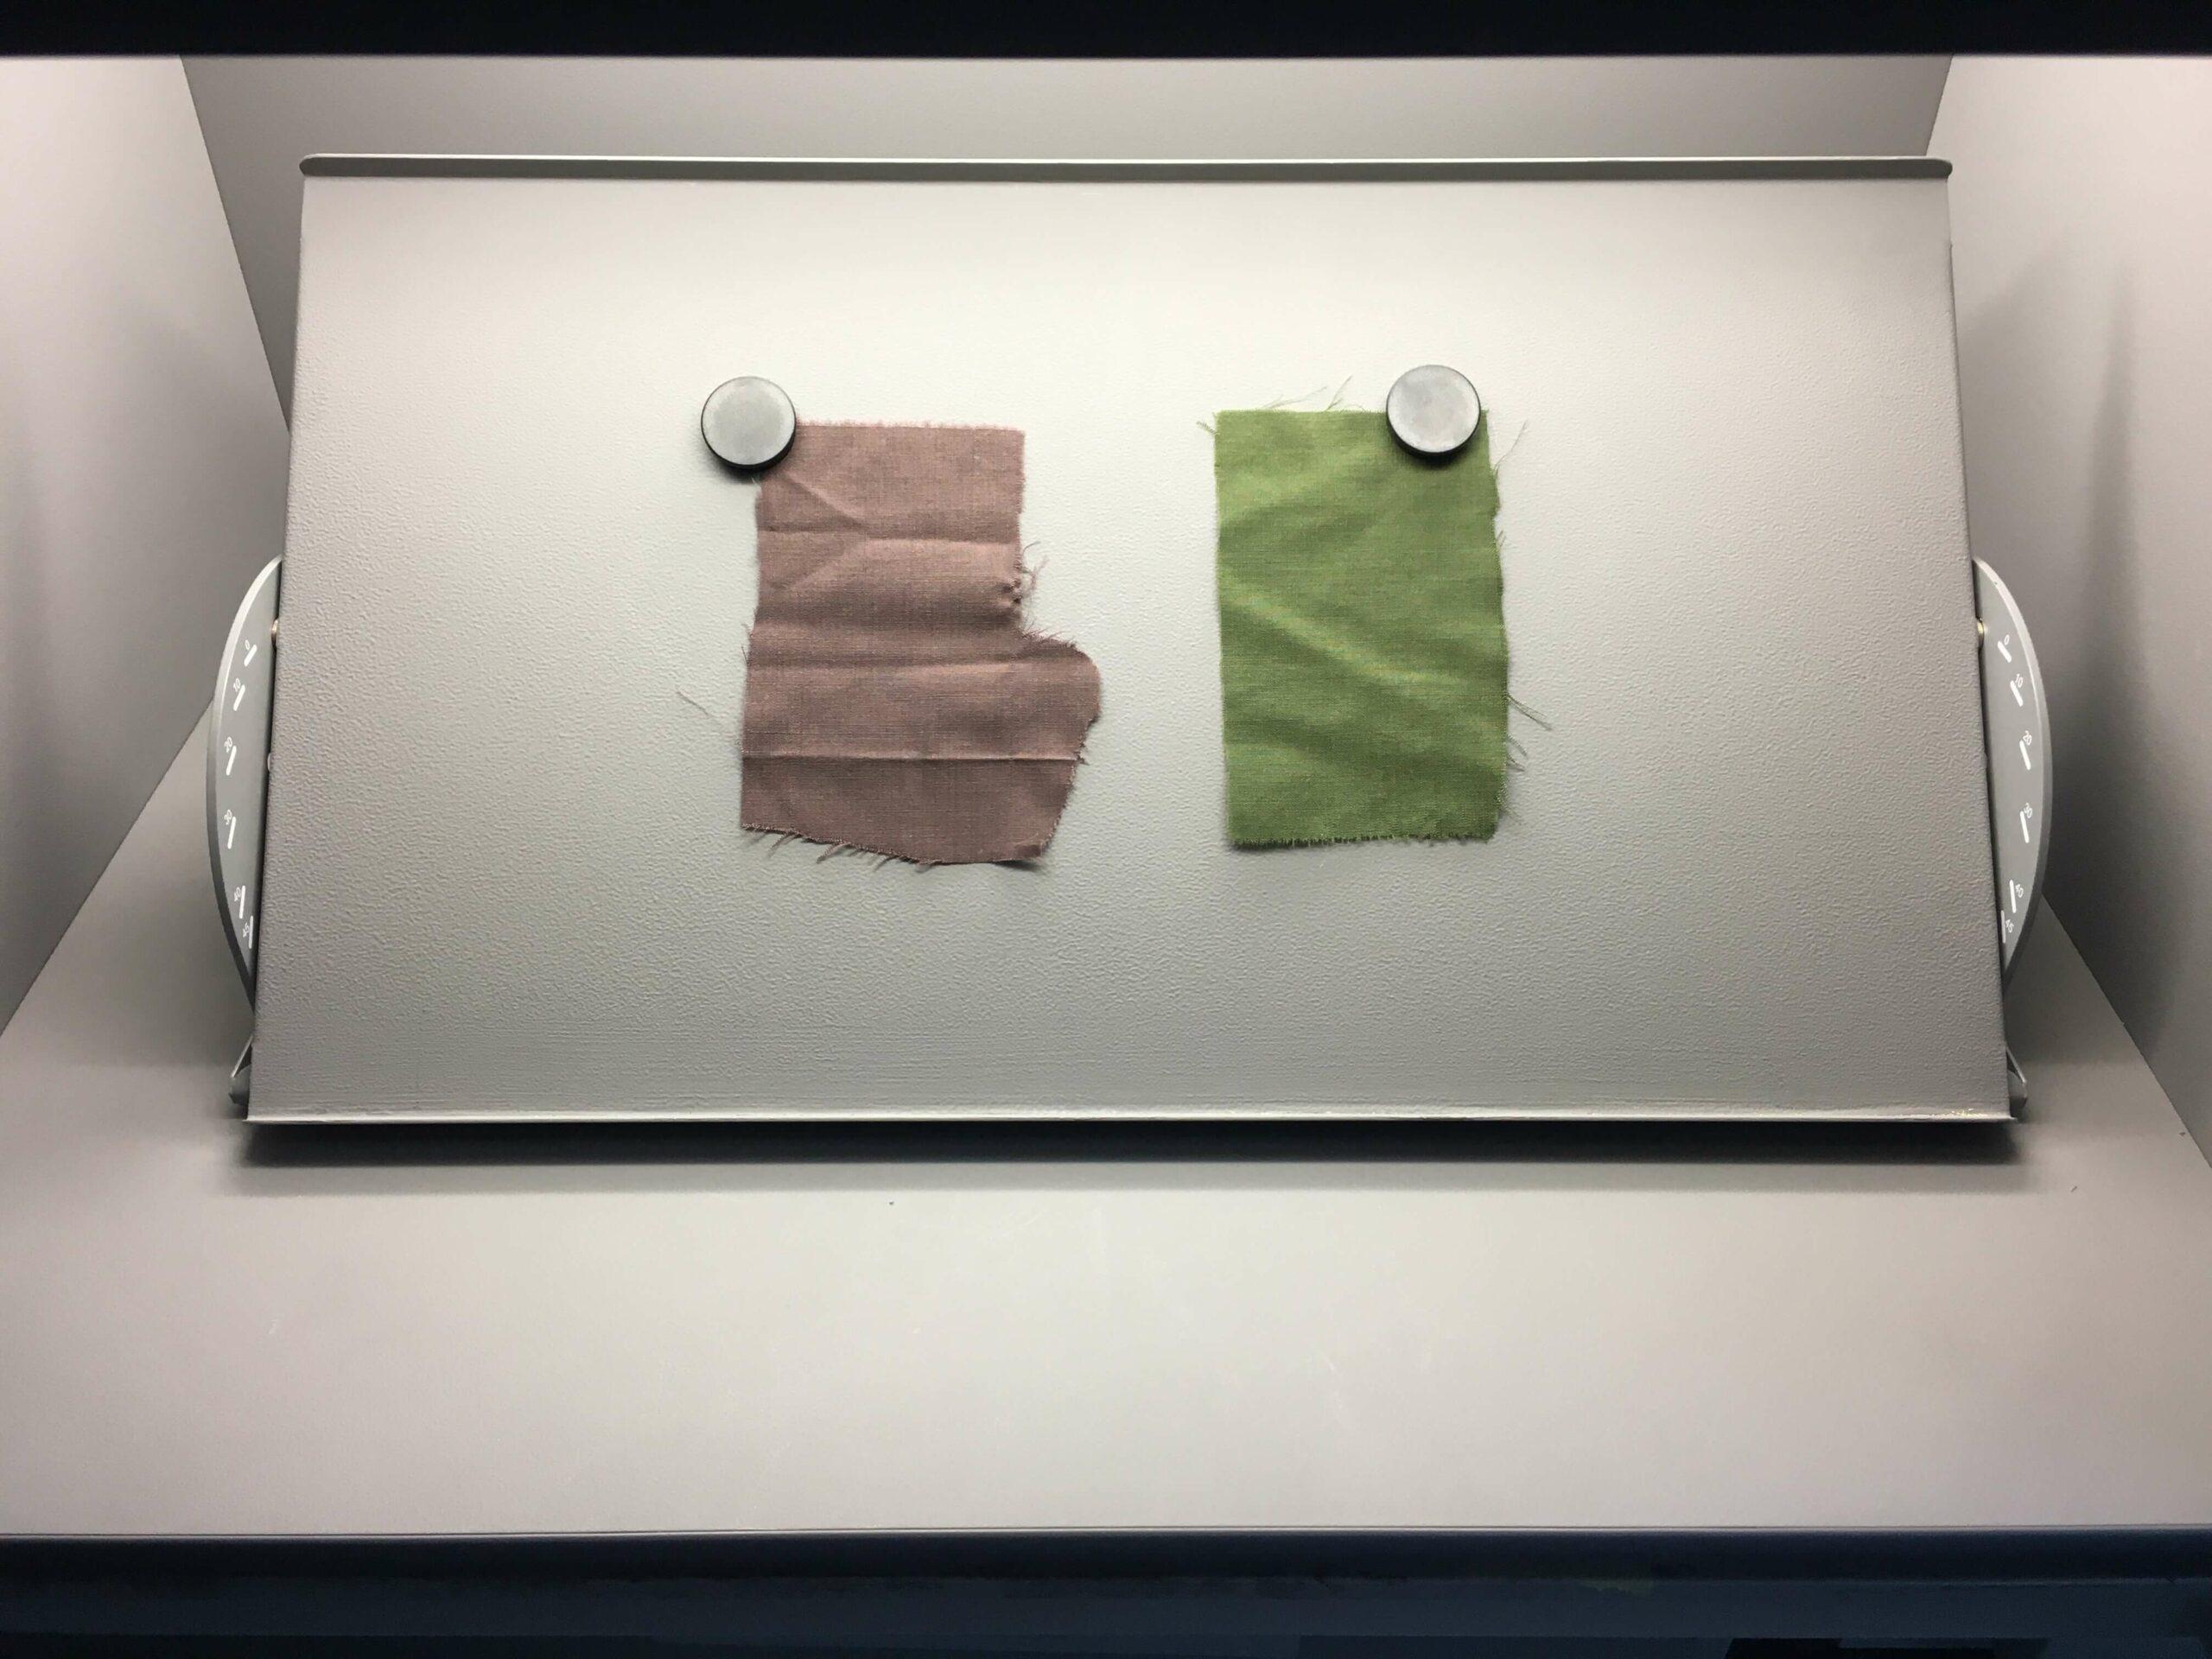 colour comparision